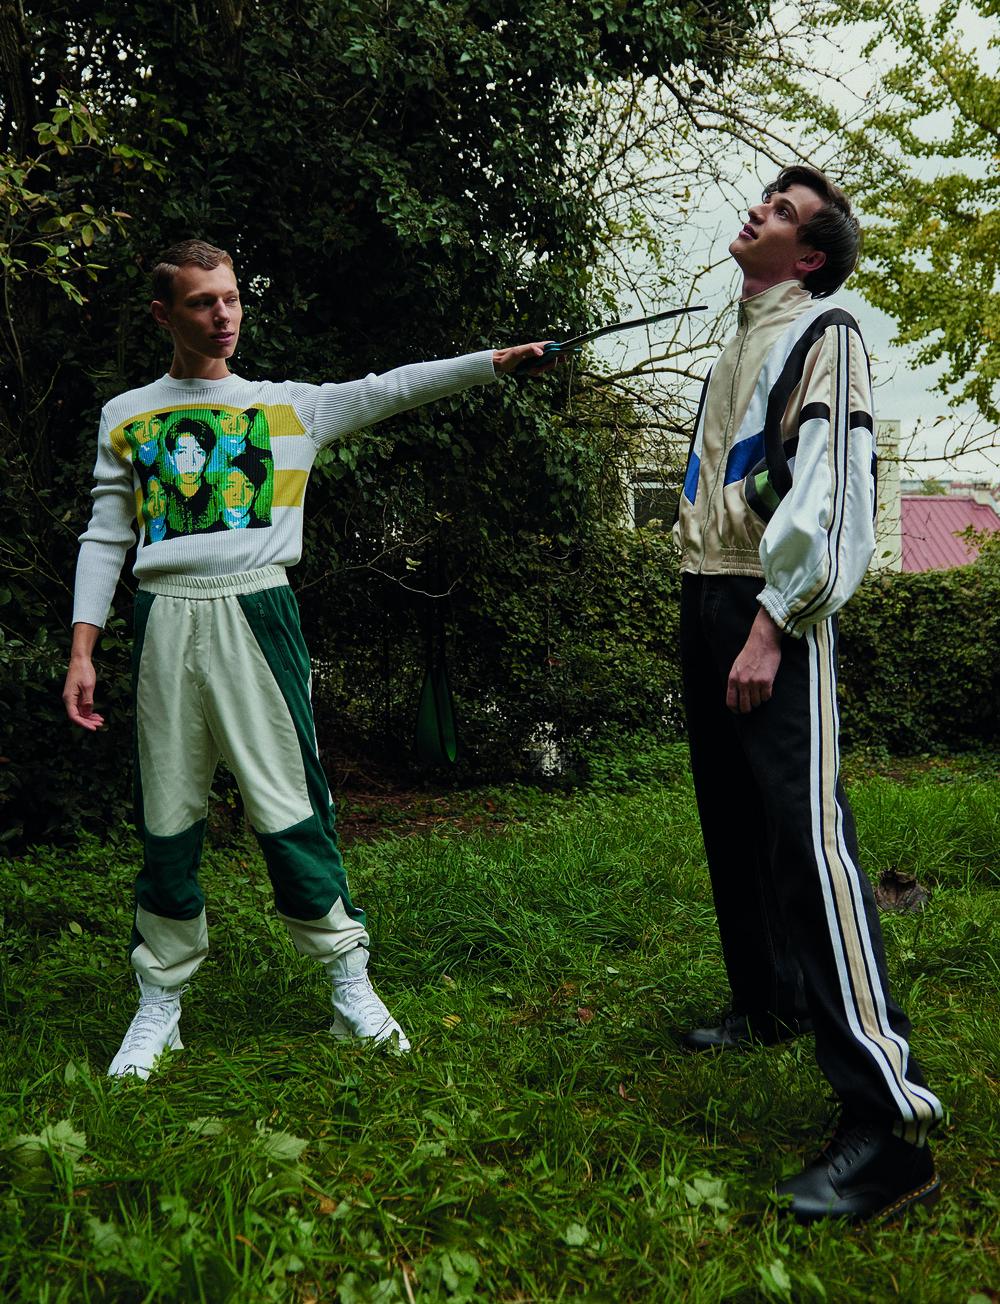 Luca wears Jumper  KENZO   Jogger  LACOSTE   Sneakers  ADIDAS   Augustin wears Tracksuit  KOCHE  Boots  DR MARTENS